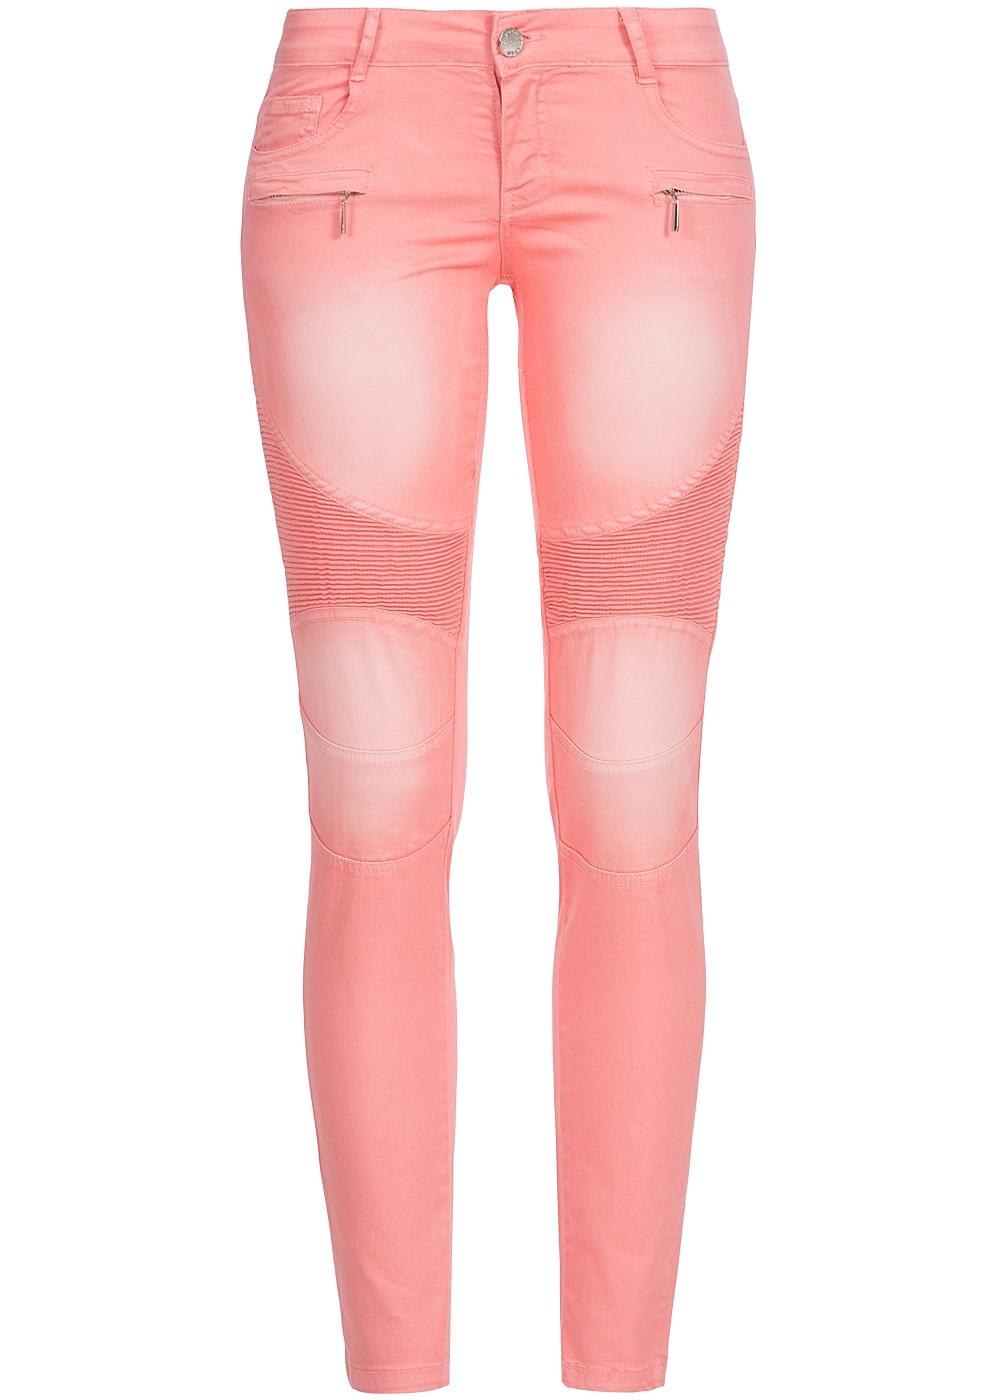 5329a210e9c8fe Seventyseven Lifestyle Hose Damen Jeans 5-Pockets 2 deko Zipper Biker Style  coral pink - 77onlineshop